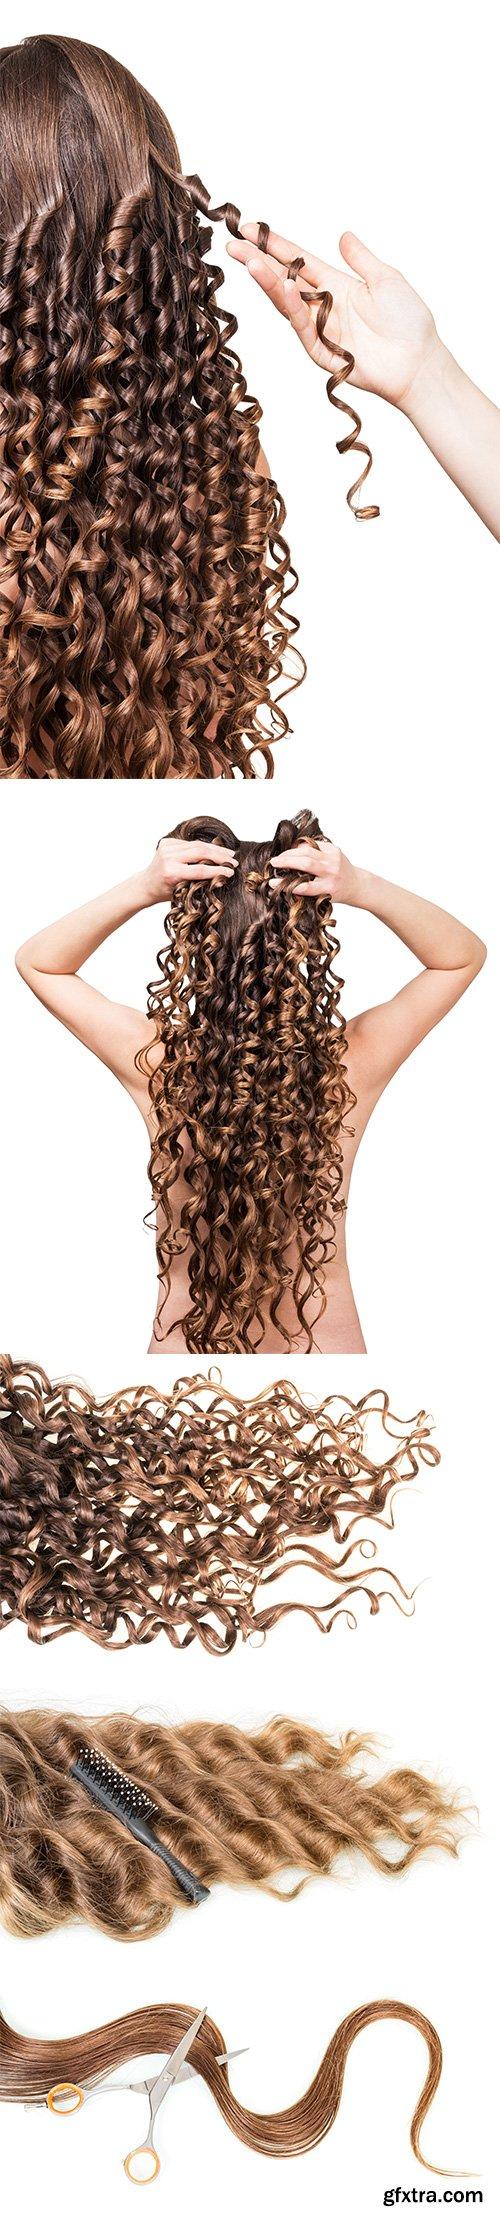 Female Hair Brown Isolated - 12xJPGs